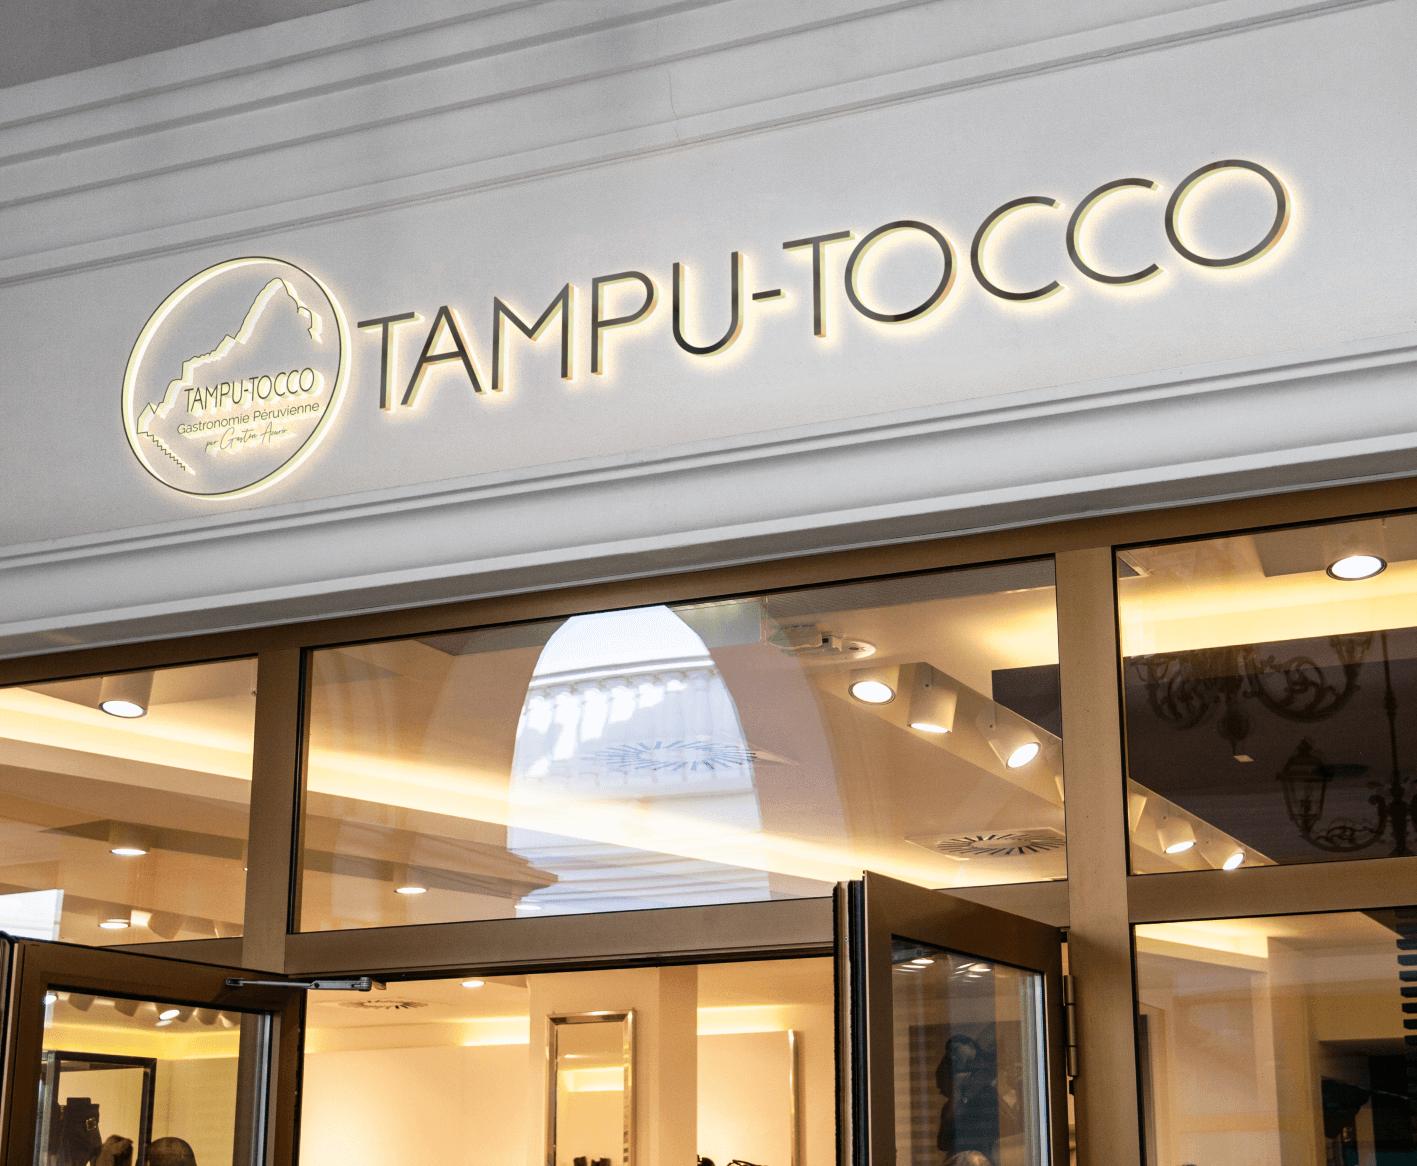 Signaletique TampuTocco facade